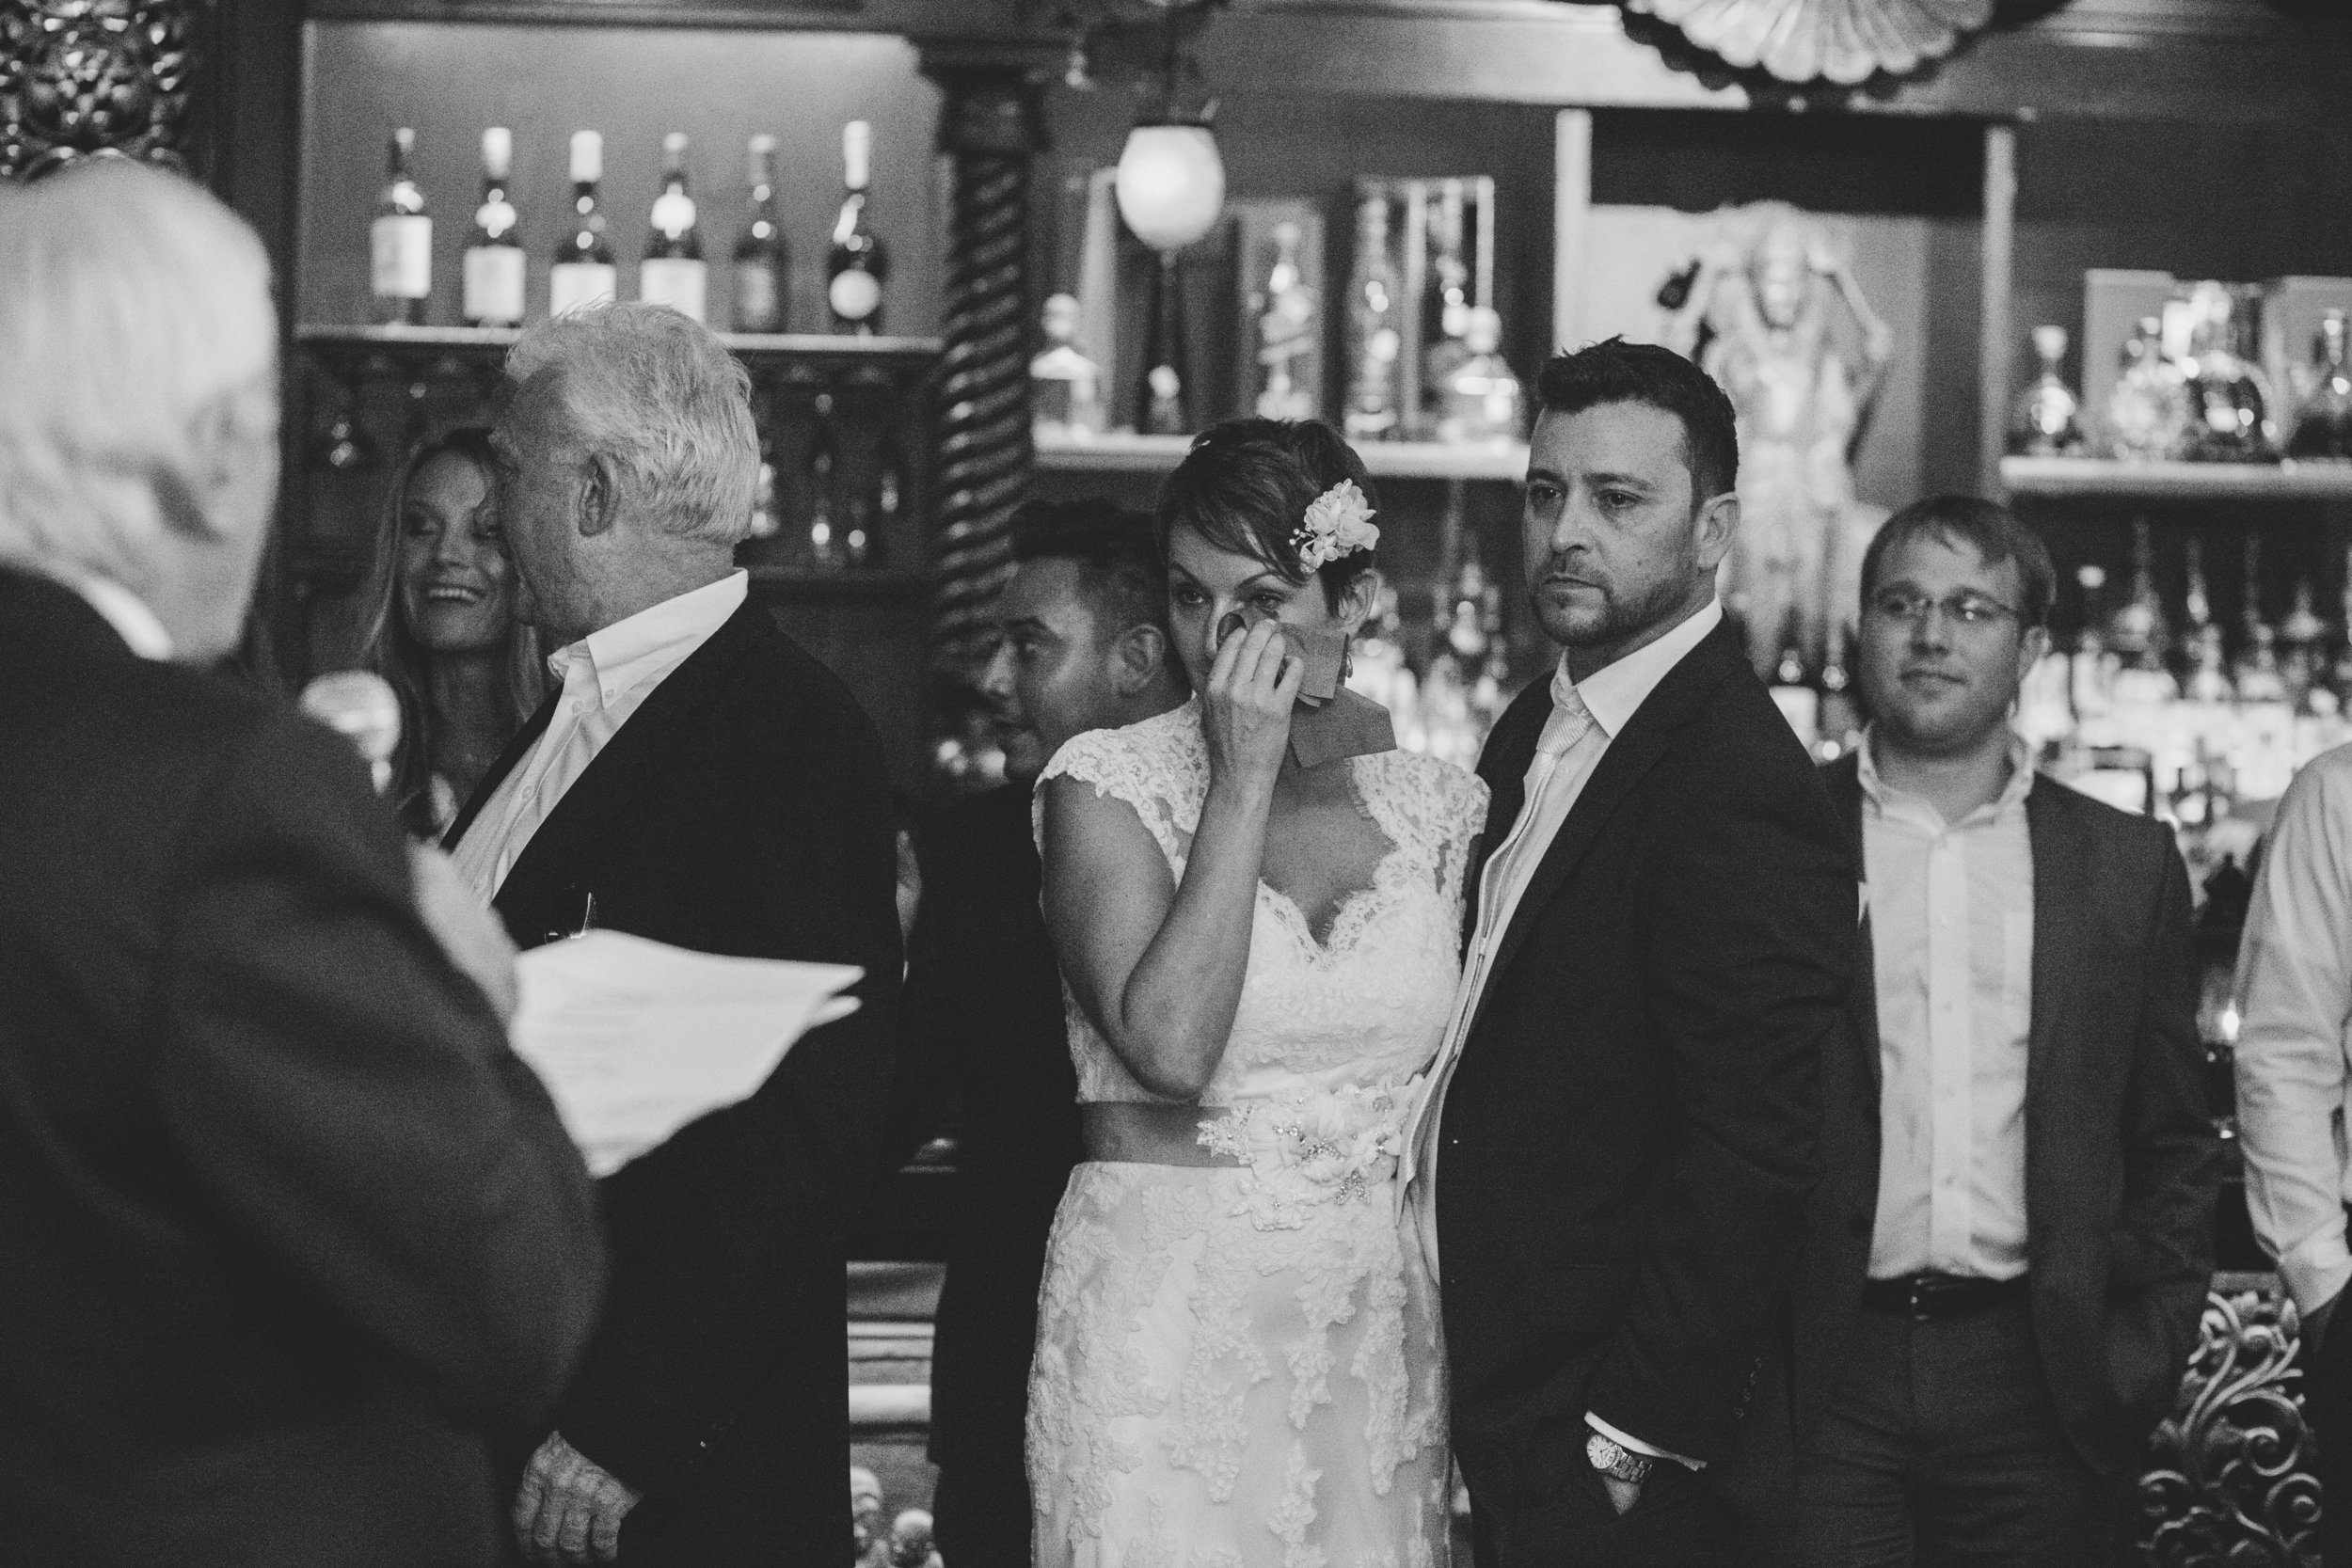 ATGI_Kat and Gabe Wedding 2016_2S8A5920.jpg